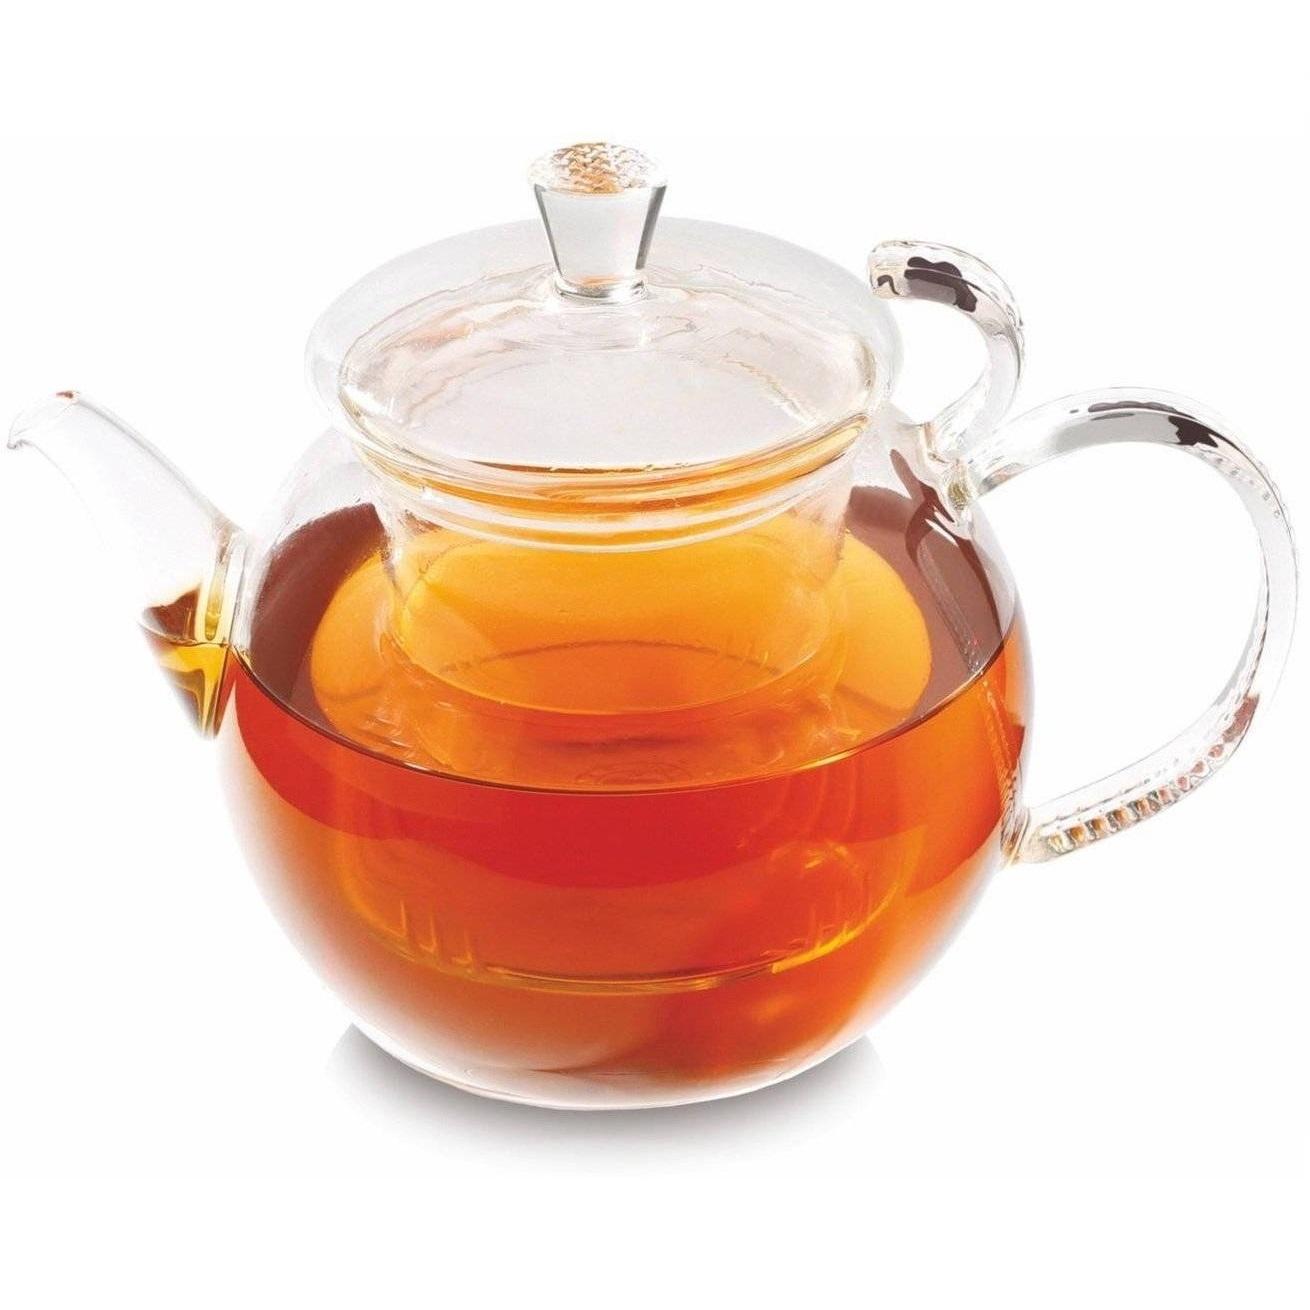 Заварочный чайник Vitax Tonbridge VX-3207, 800 мл